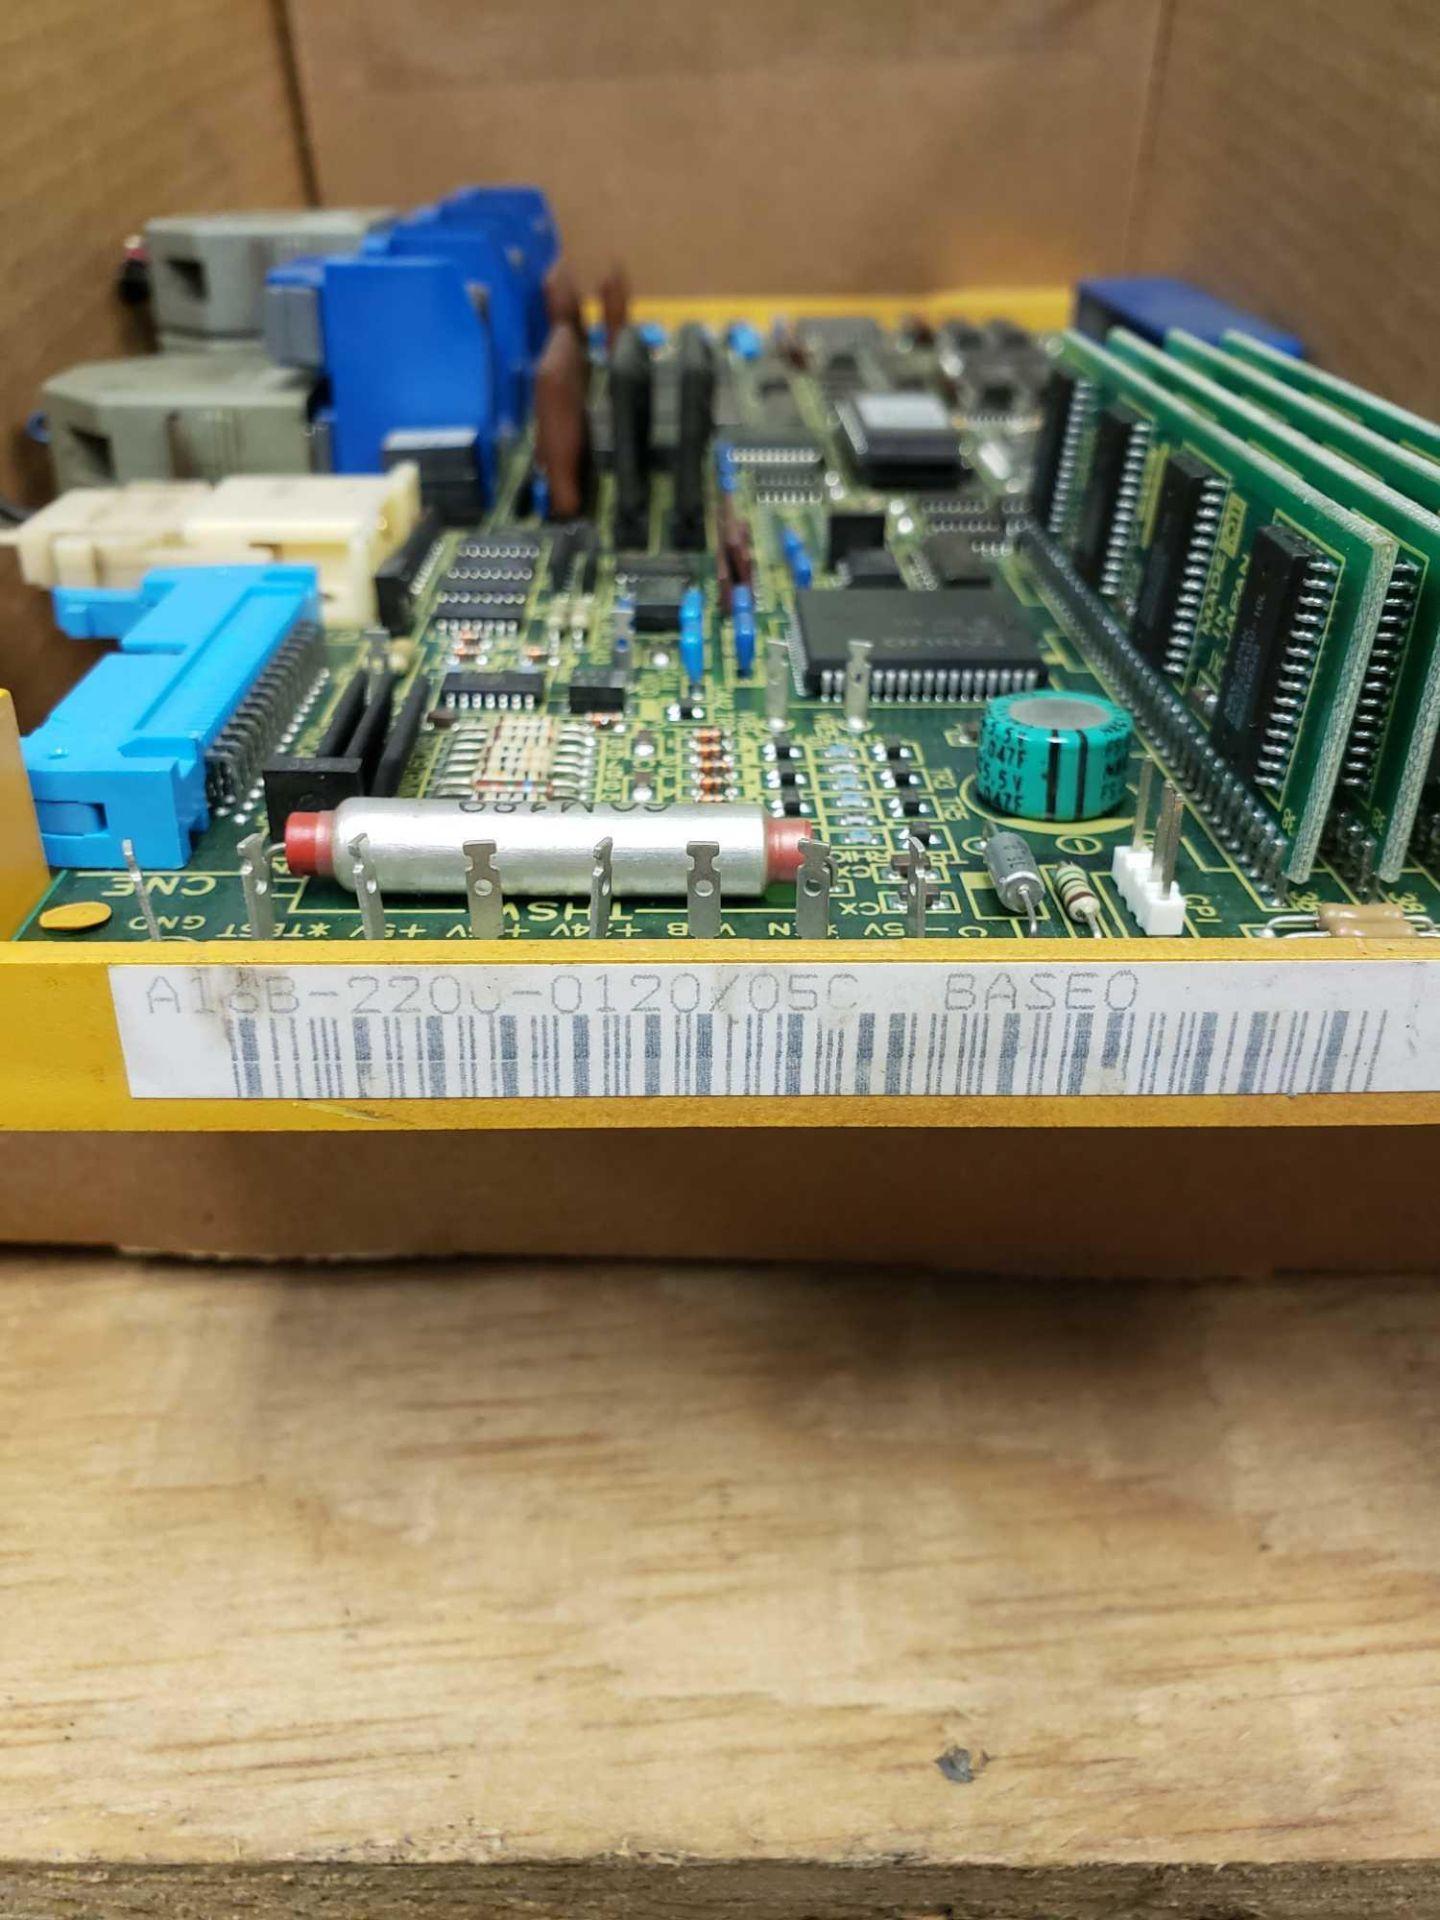 Lot 32 - Fanuc A16B-2200-0120/05C control board